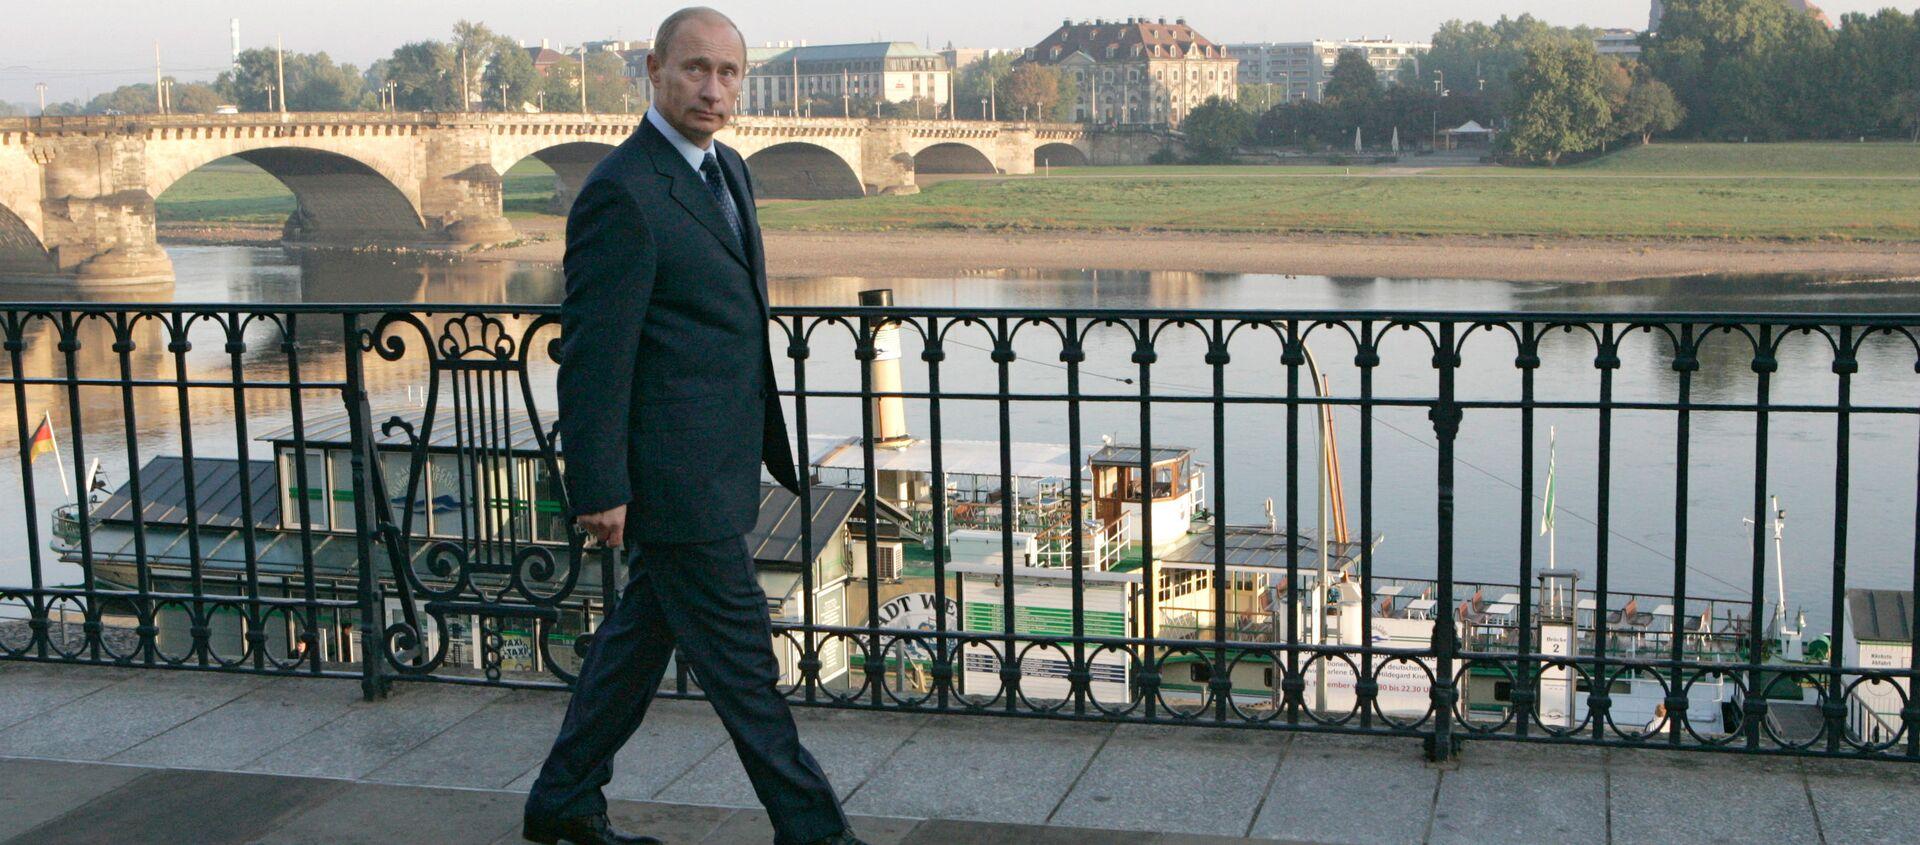 Vladímir Putin, presidente de Rusia, en Dresde, Alemania (archivo) - Sputnik Mundo, 1920, 15.03.2018